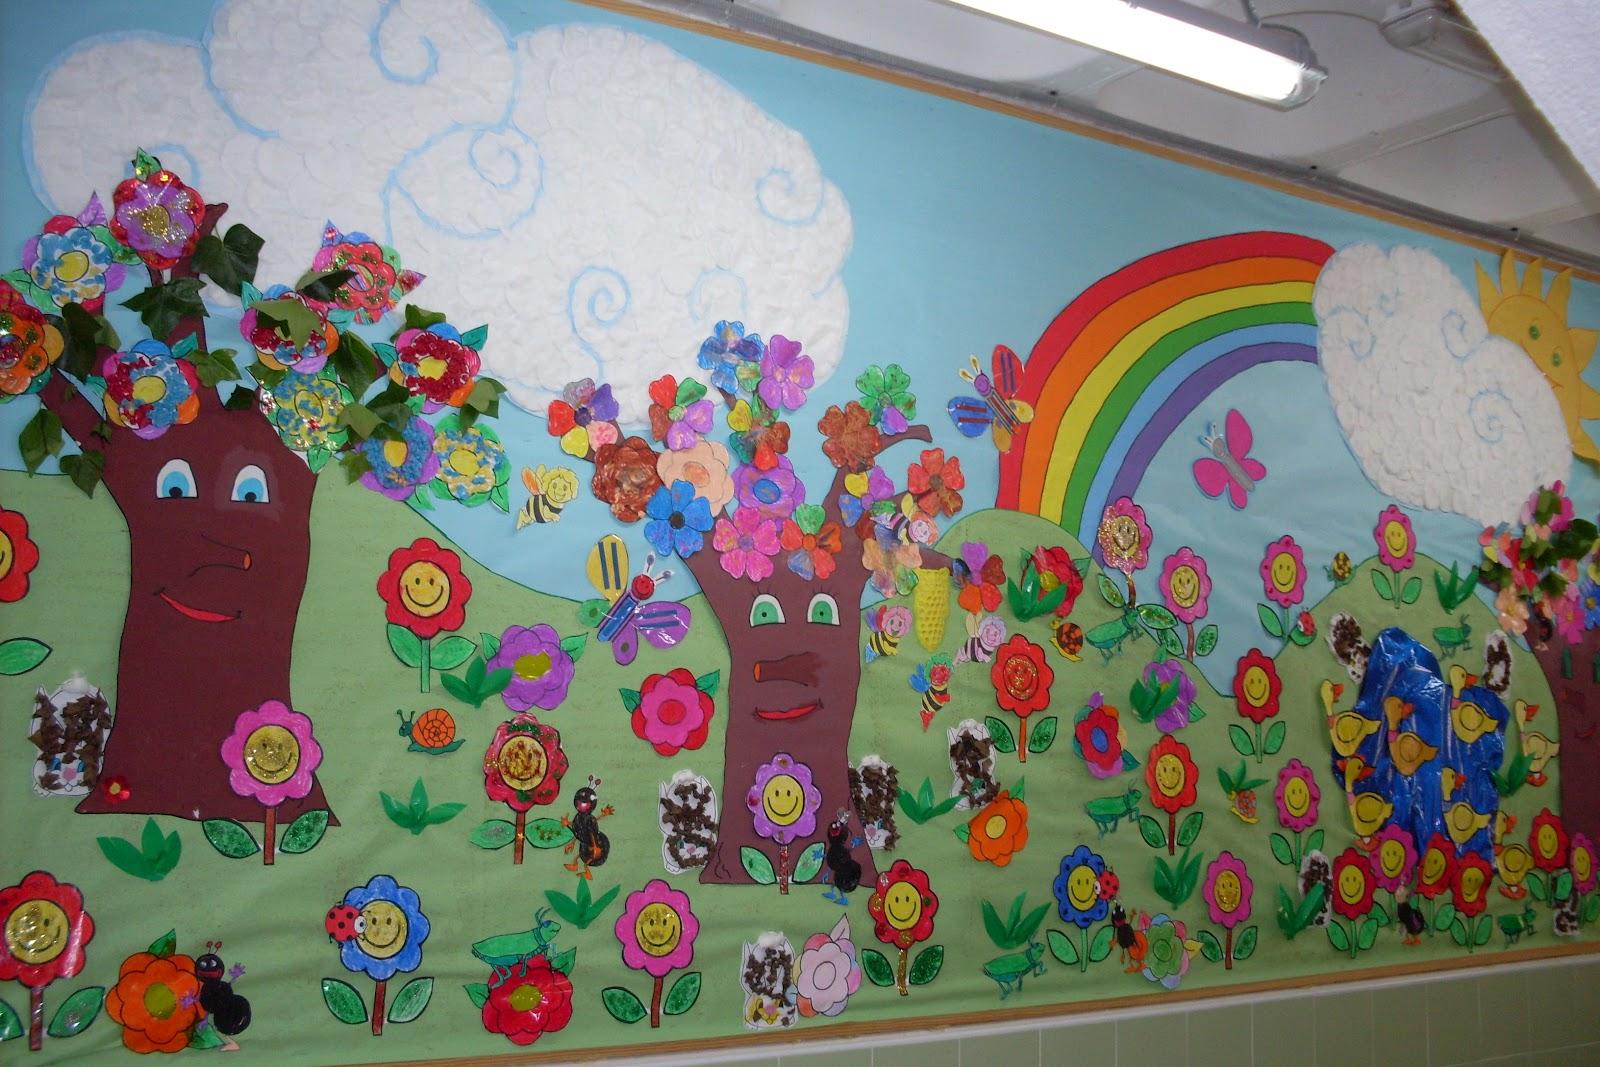 Blog de educaci n infantil bienvenida primavera for Decoracion primavera infantil